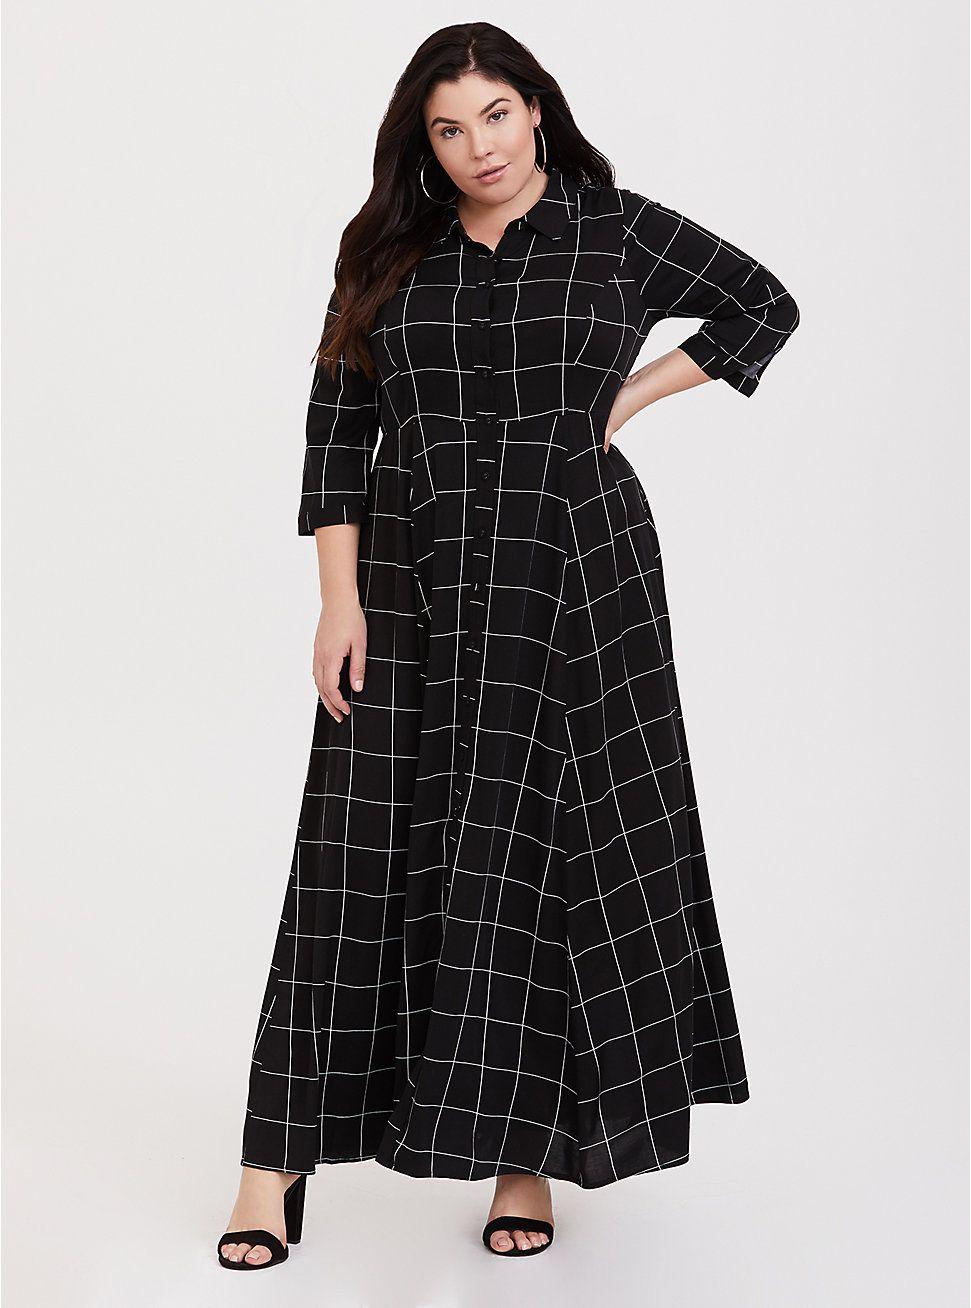 Black Grid Challis Maxi Shirt Dress | Dresses in 2019 | Maxi ...